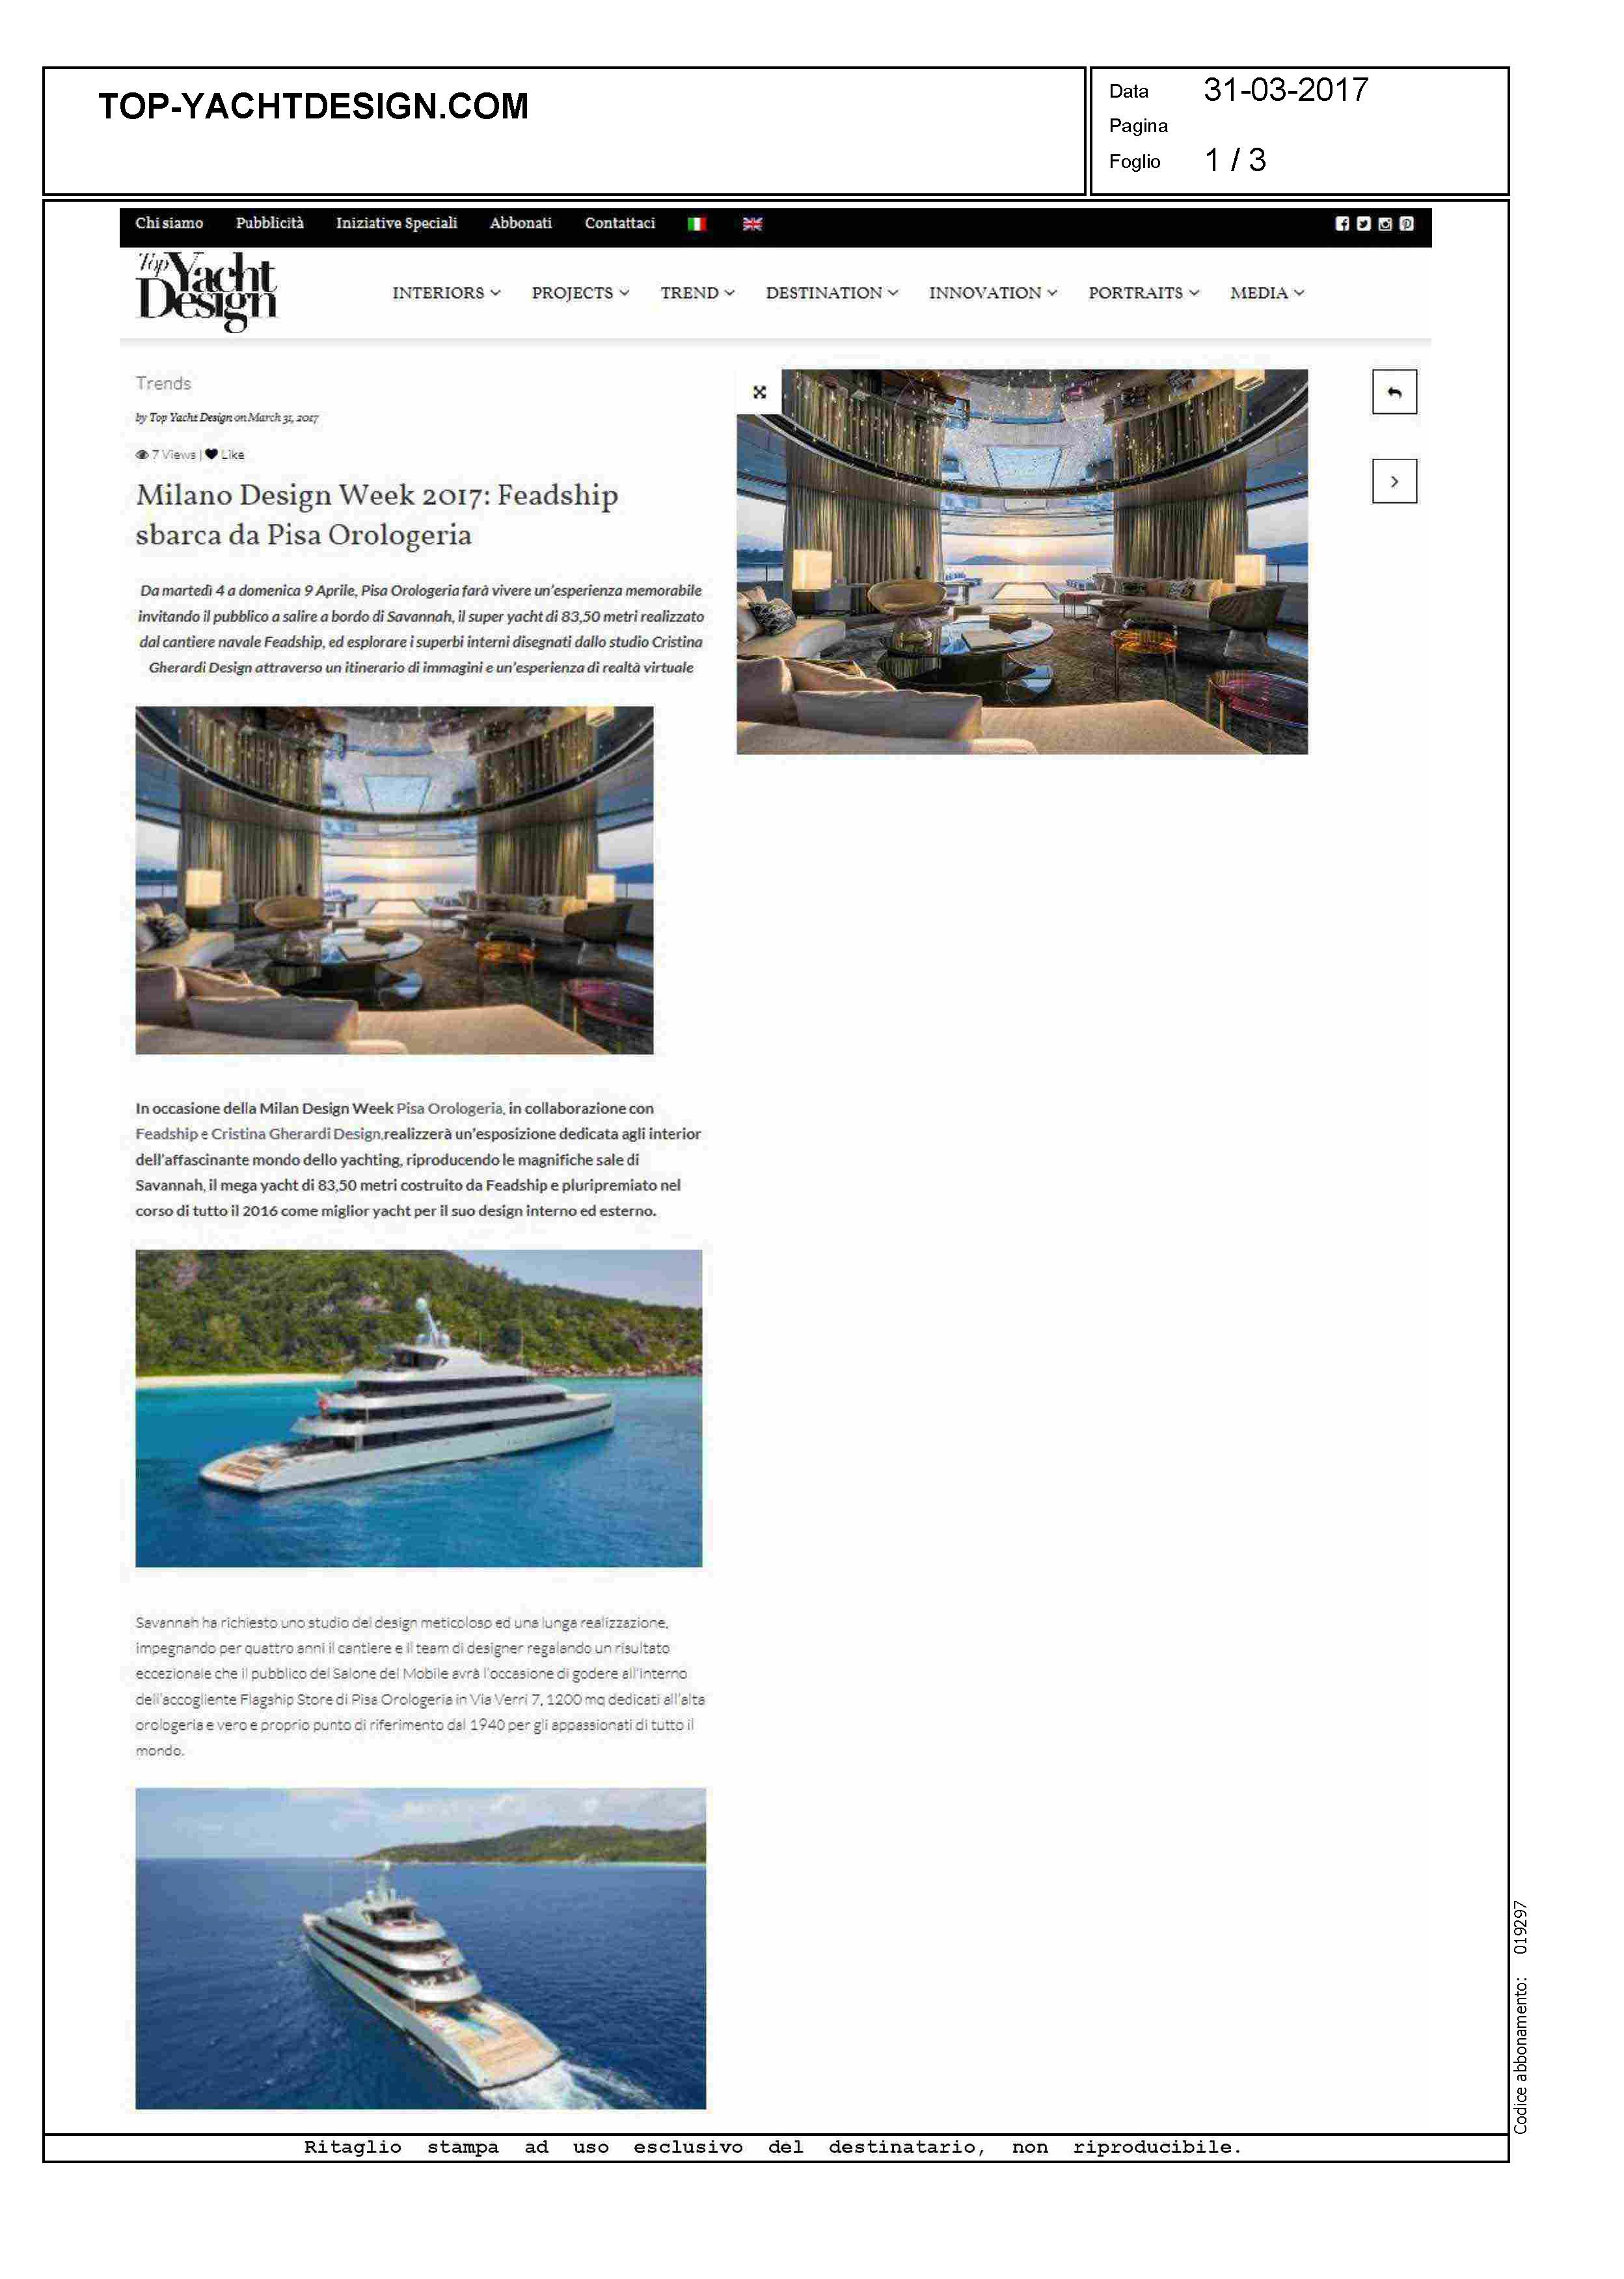 Milano design week 2017 feadship at pisaorologeria for Yacht design milano